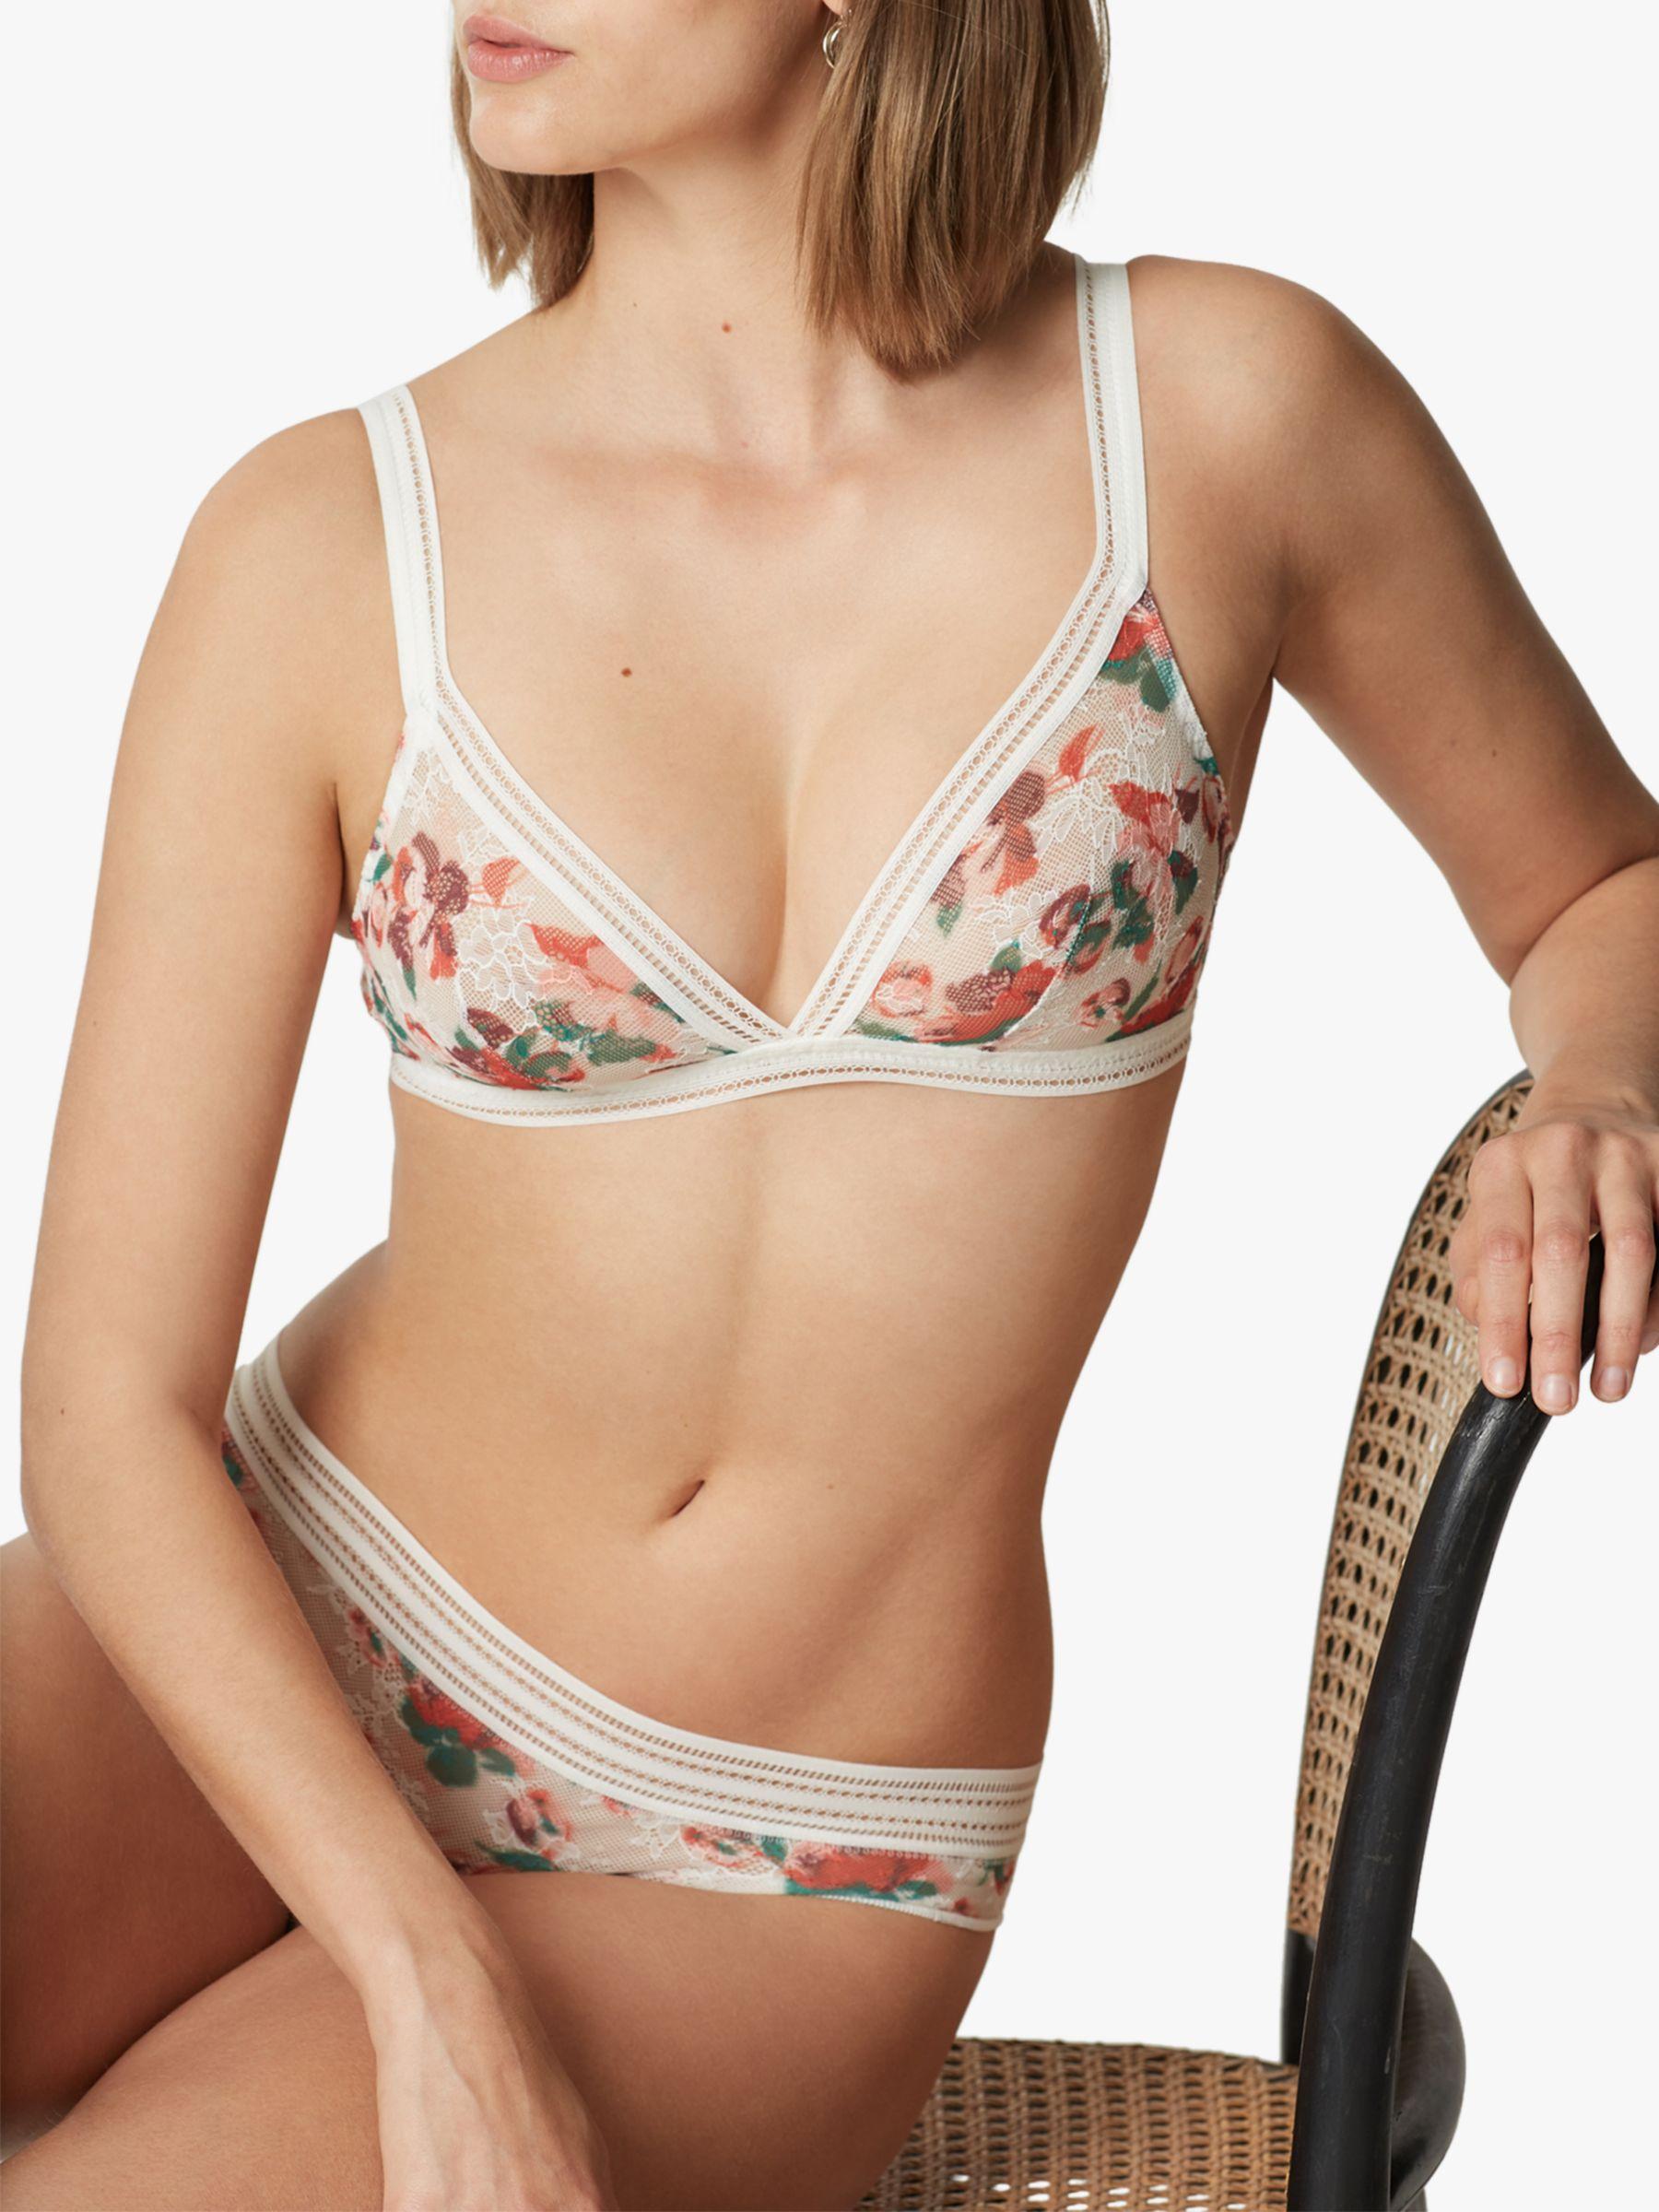 Maison Lejaby Maison Lejaby Miss Lejaby Bikini Tanga Briefs, White/Multi